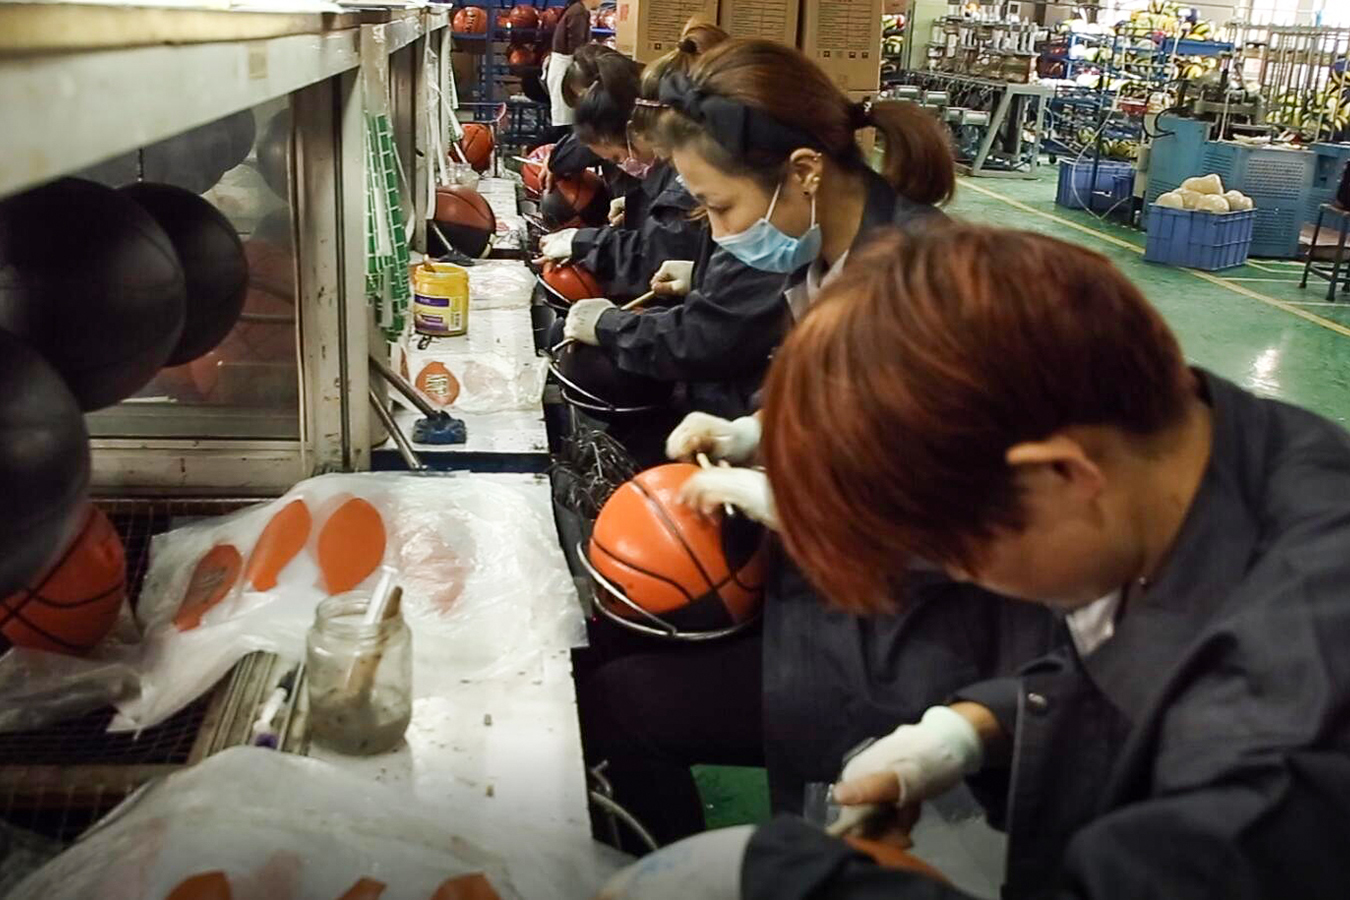 Gluing basketball panels